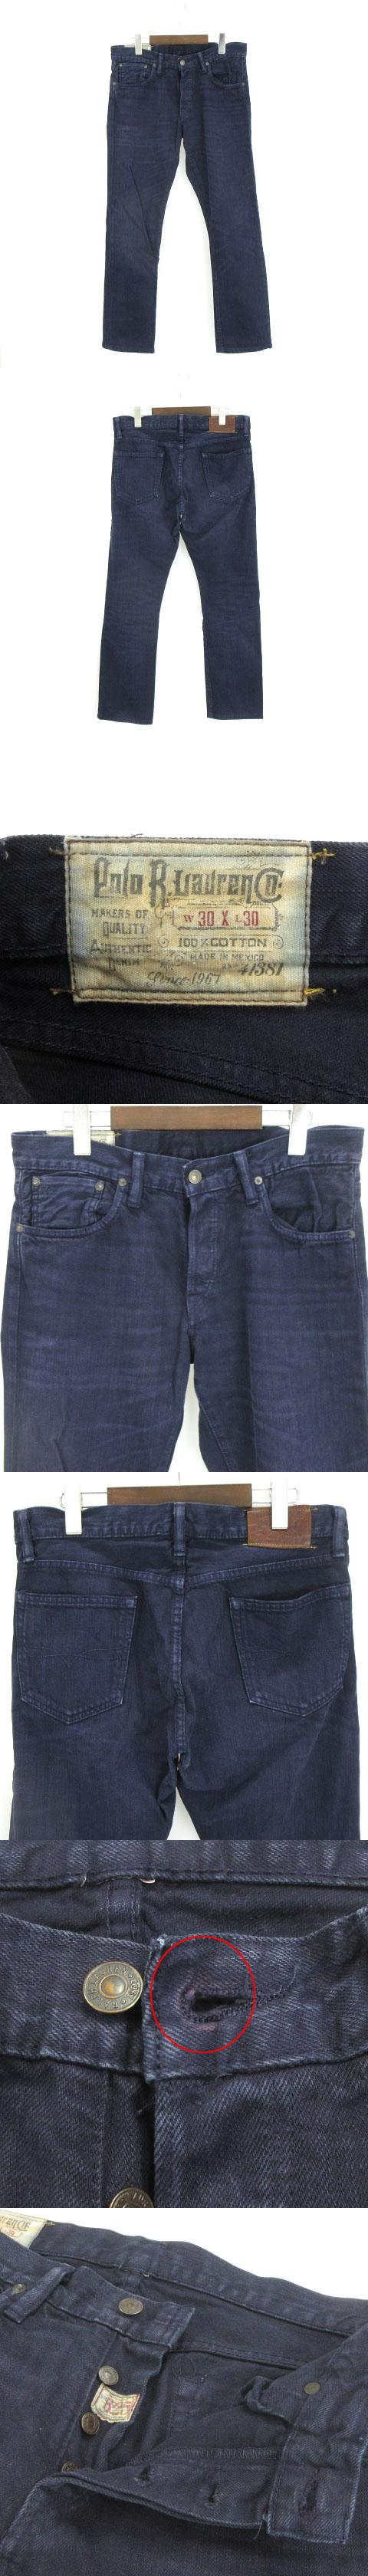 VARICK SLIM 625 カラー デニム パンツ ストレート ネイビー 紺 W30 L30